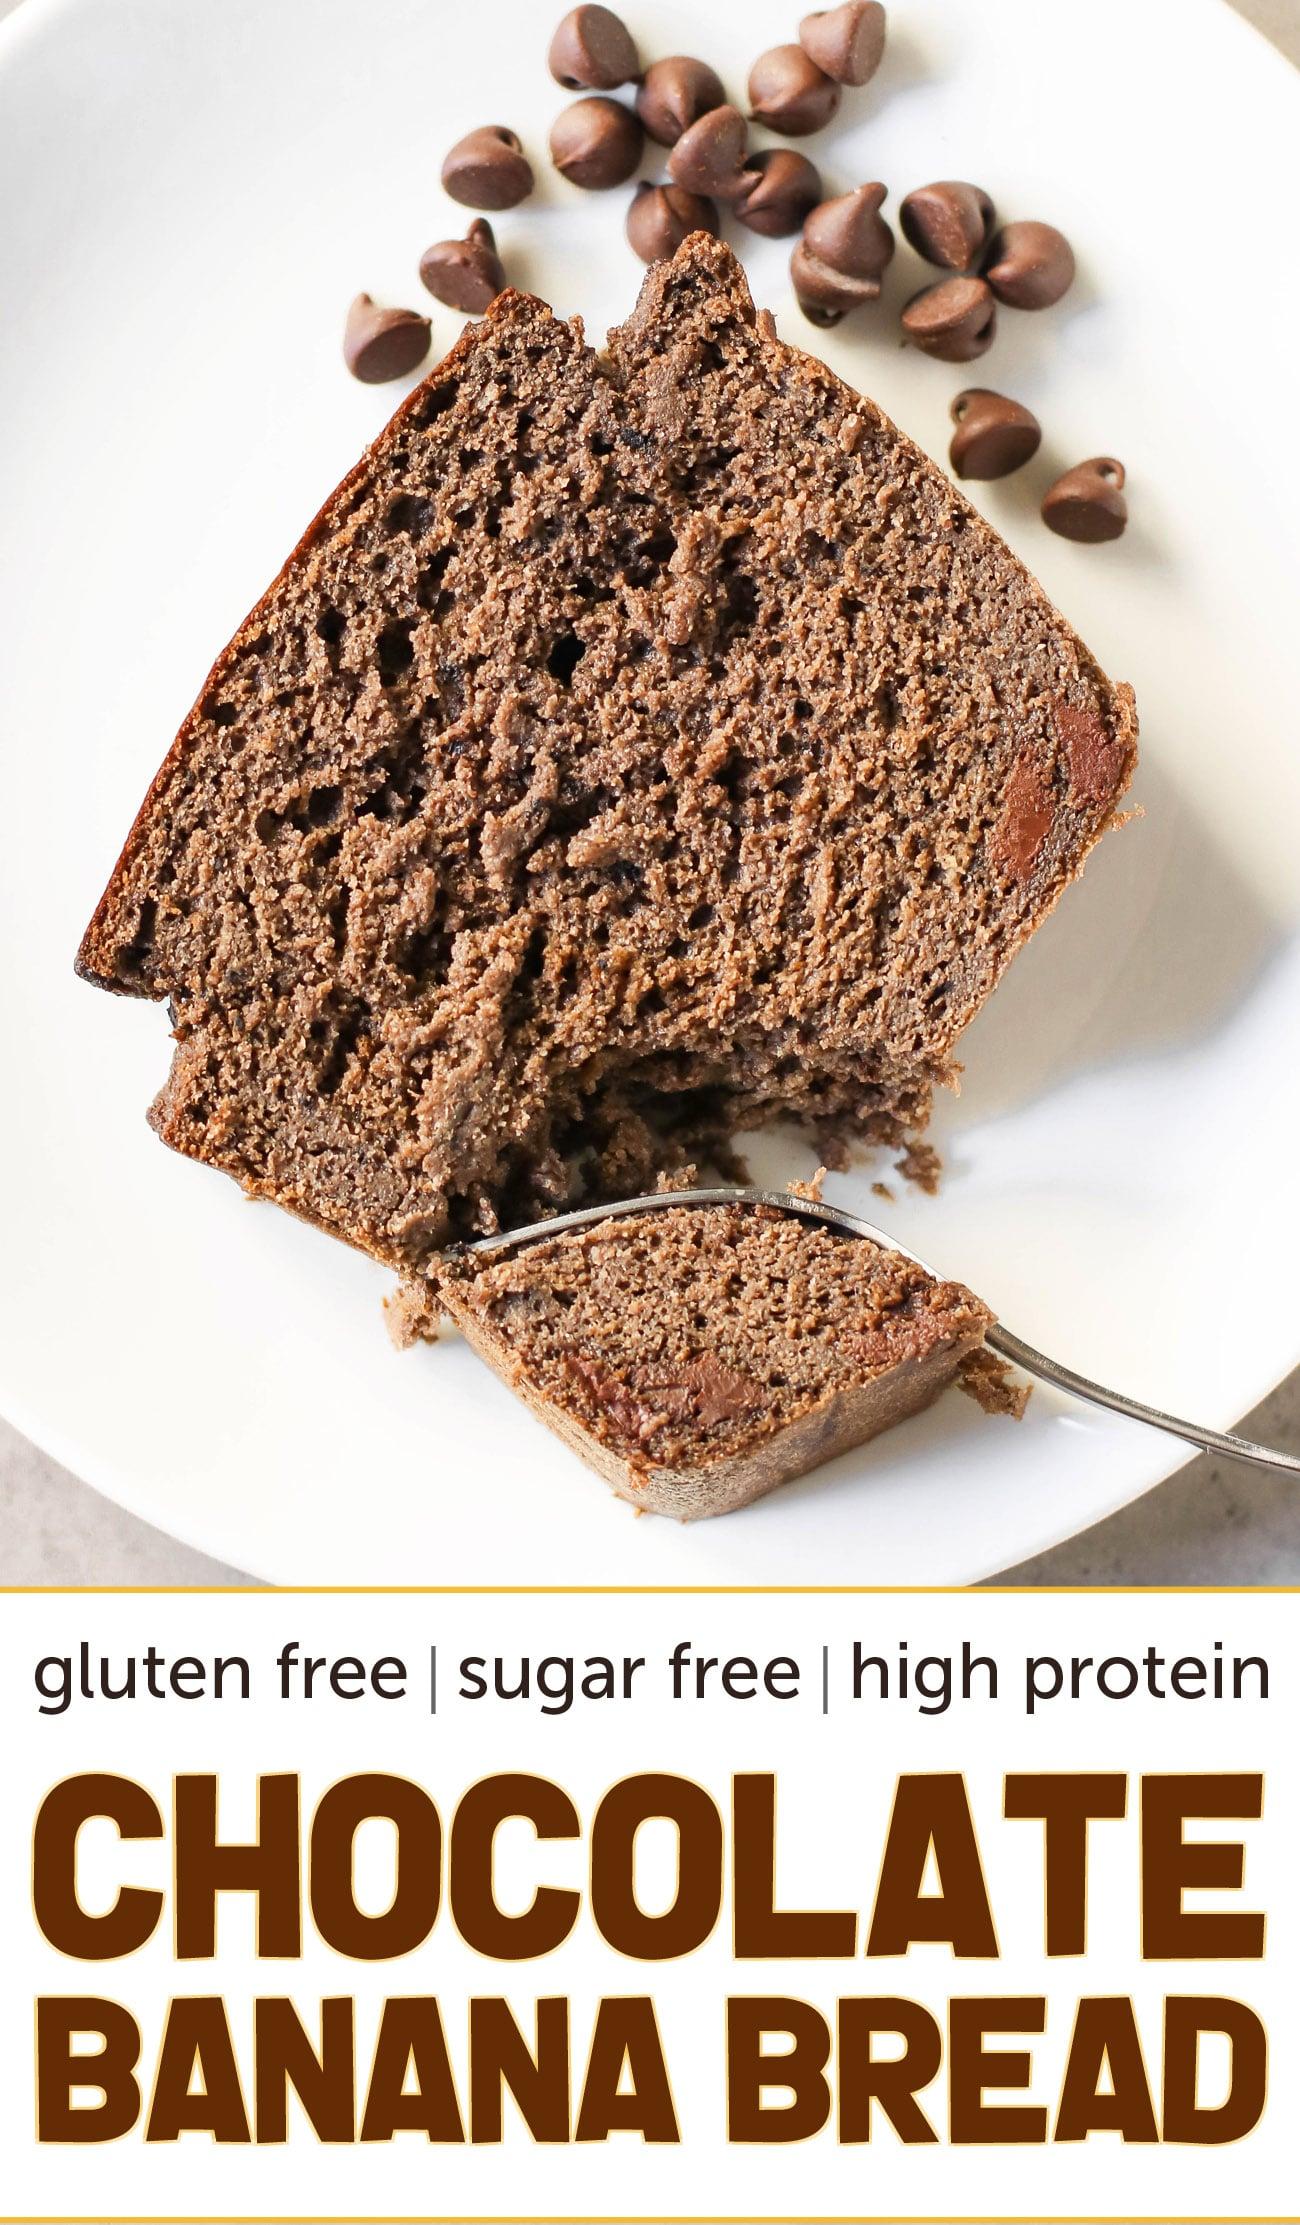 Double Chocolate Banana Bread (sugar free, high protein, high fiber, gluten free, dairy free)